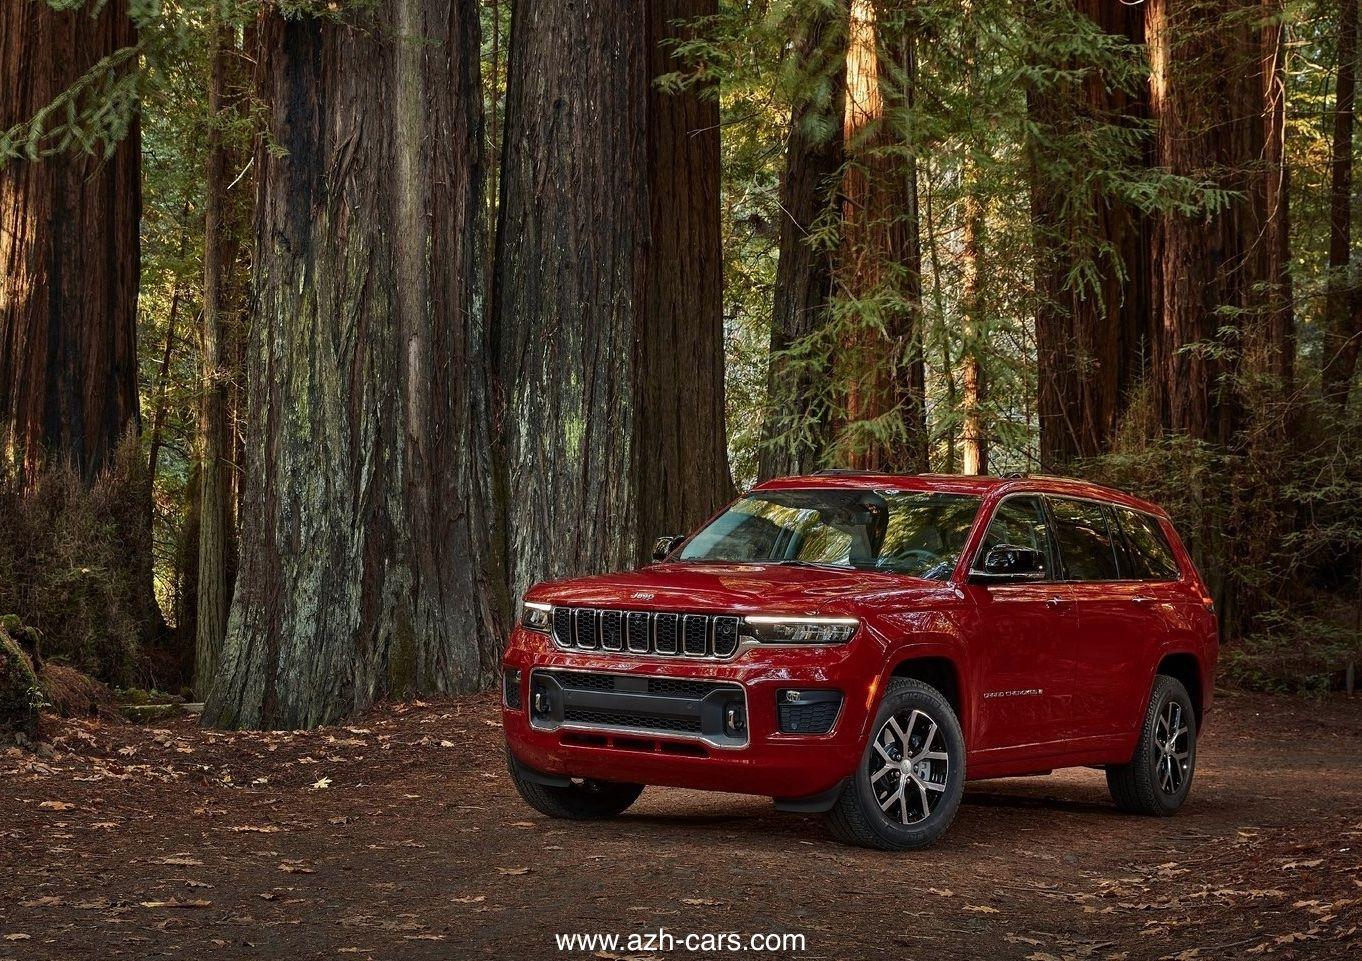 Jeep Grand Cherokee L 2021 In 2021 Jeep Grand Cherokee Jeep Grands